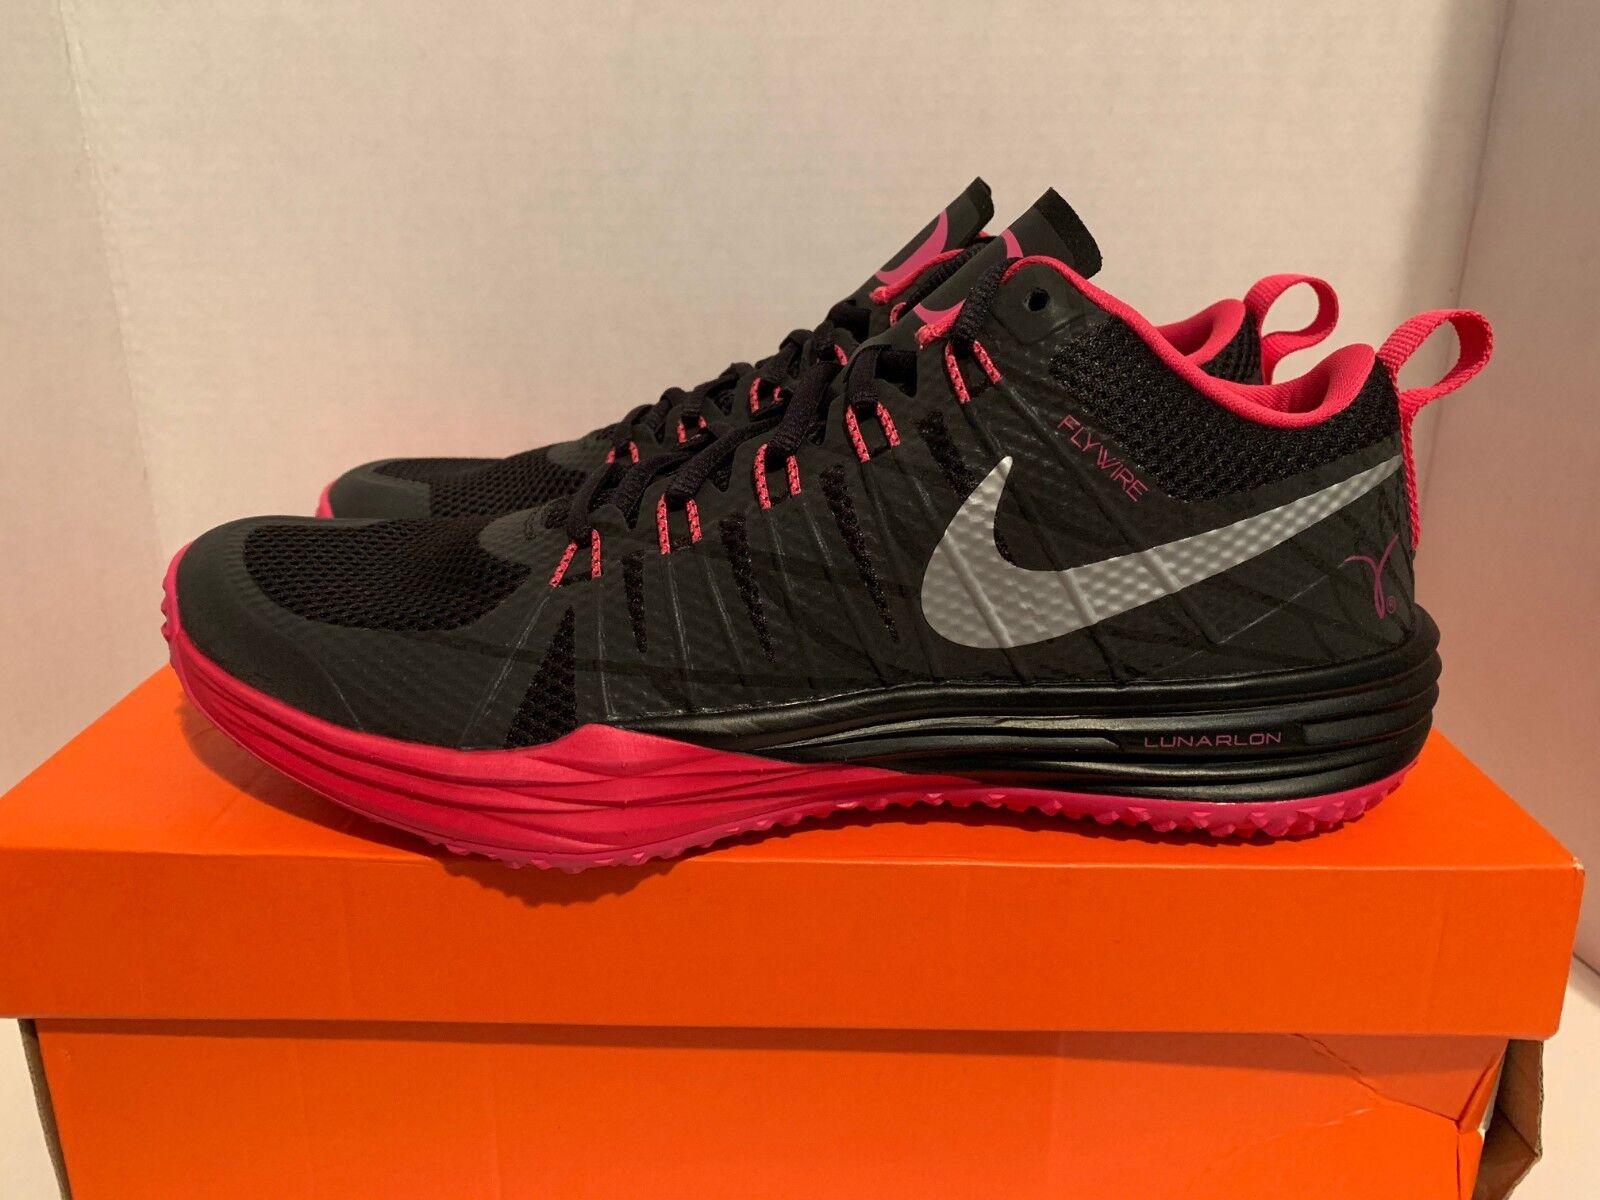 Nike Lunar TR1 NRG Kay Yow Cancer Oregon Ducks LE QS Sneakers Men's Size 11 12